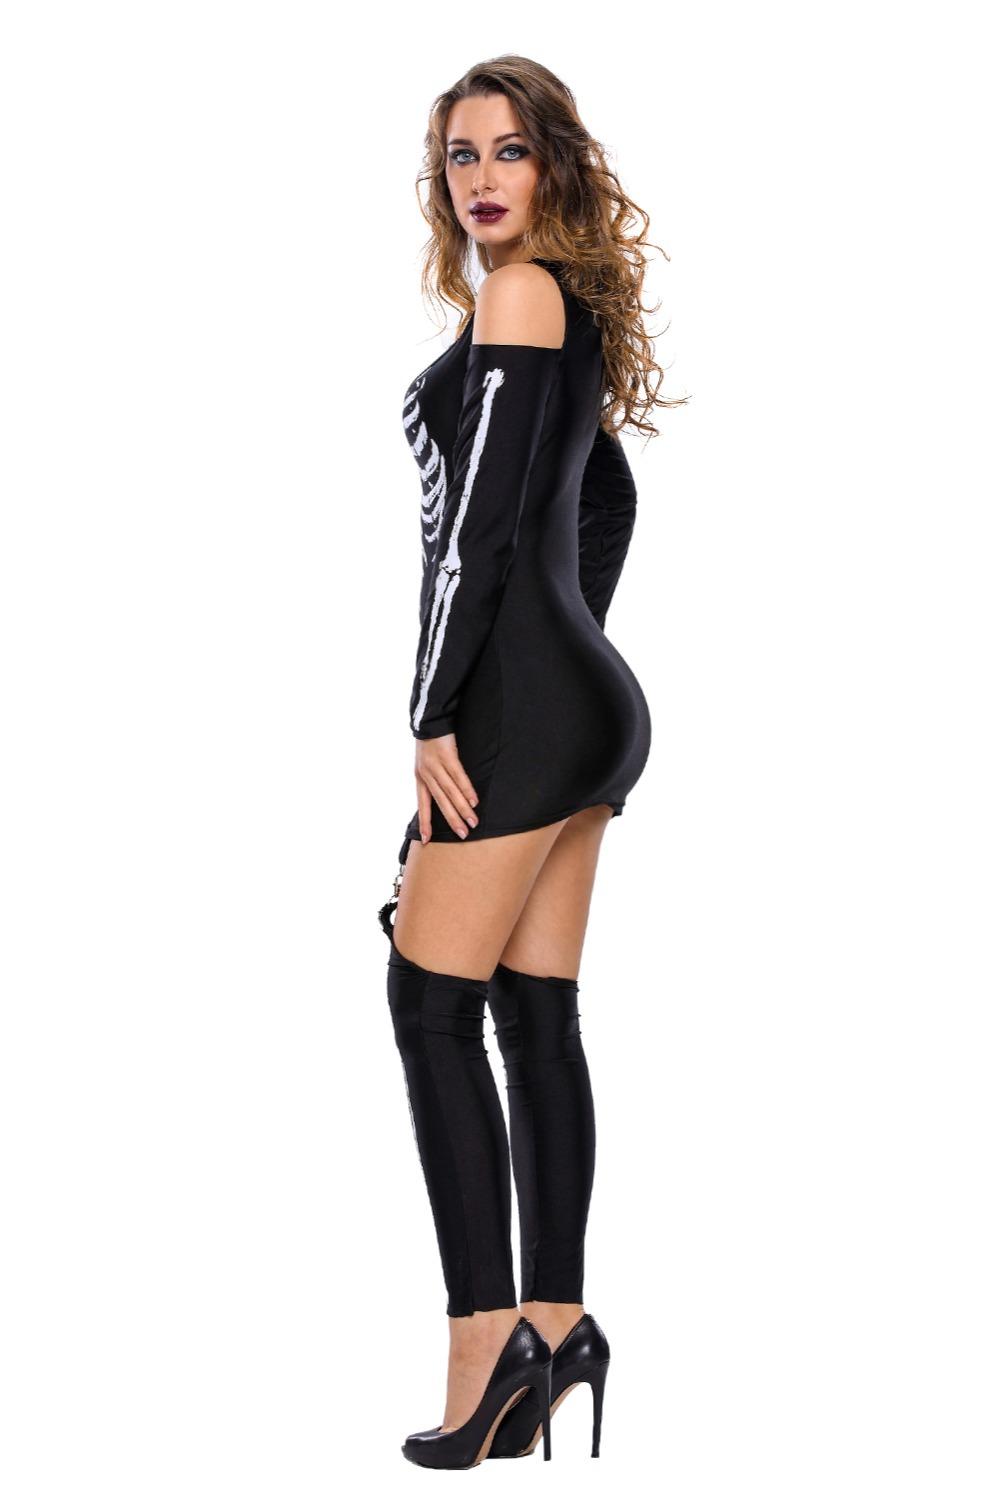 X-rayed-Halloween-Off-shoulder-Skeleton-Dress-Costume-LC89025-2-4